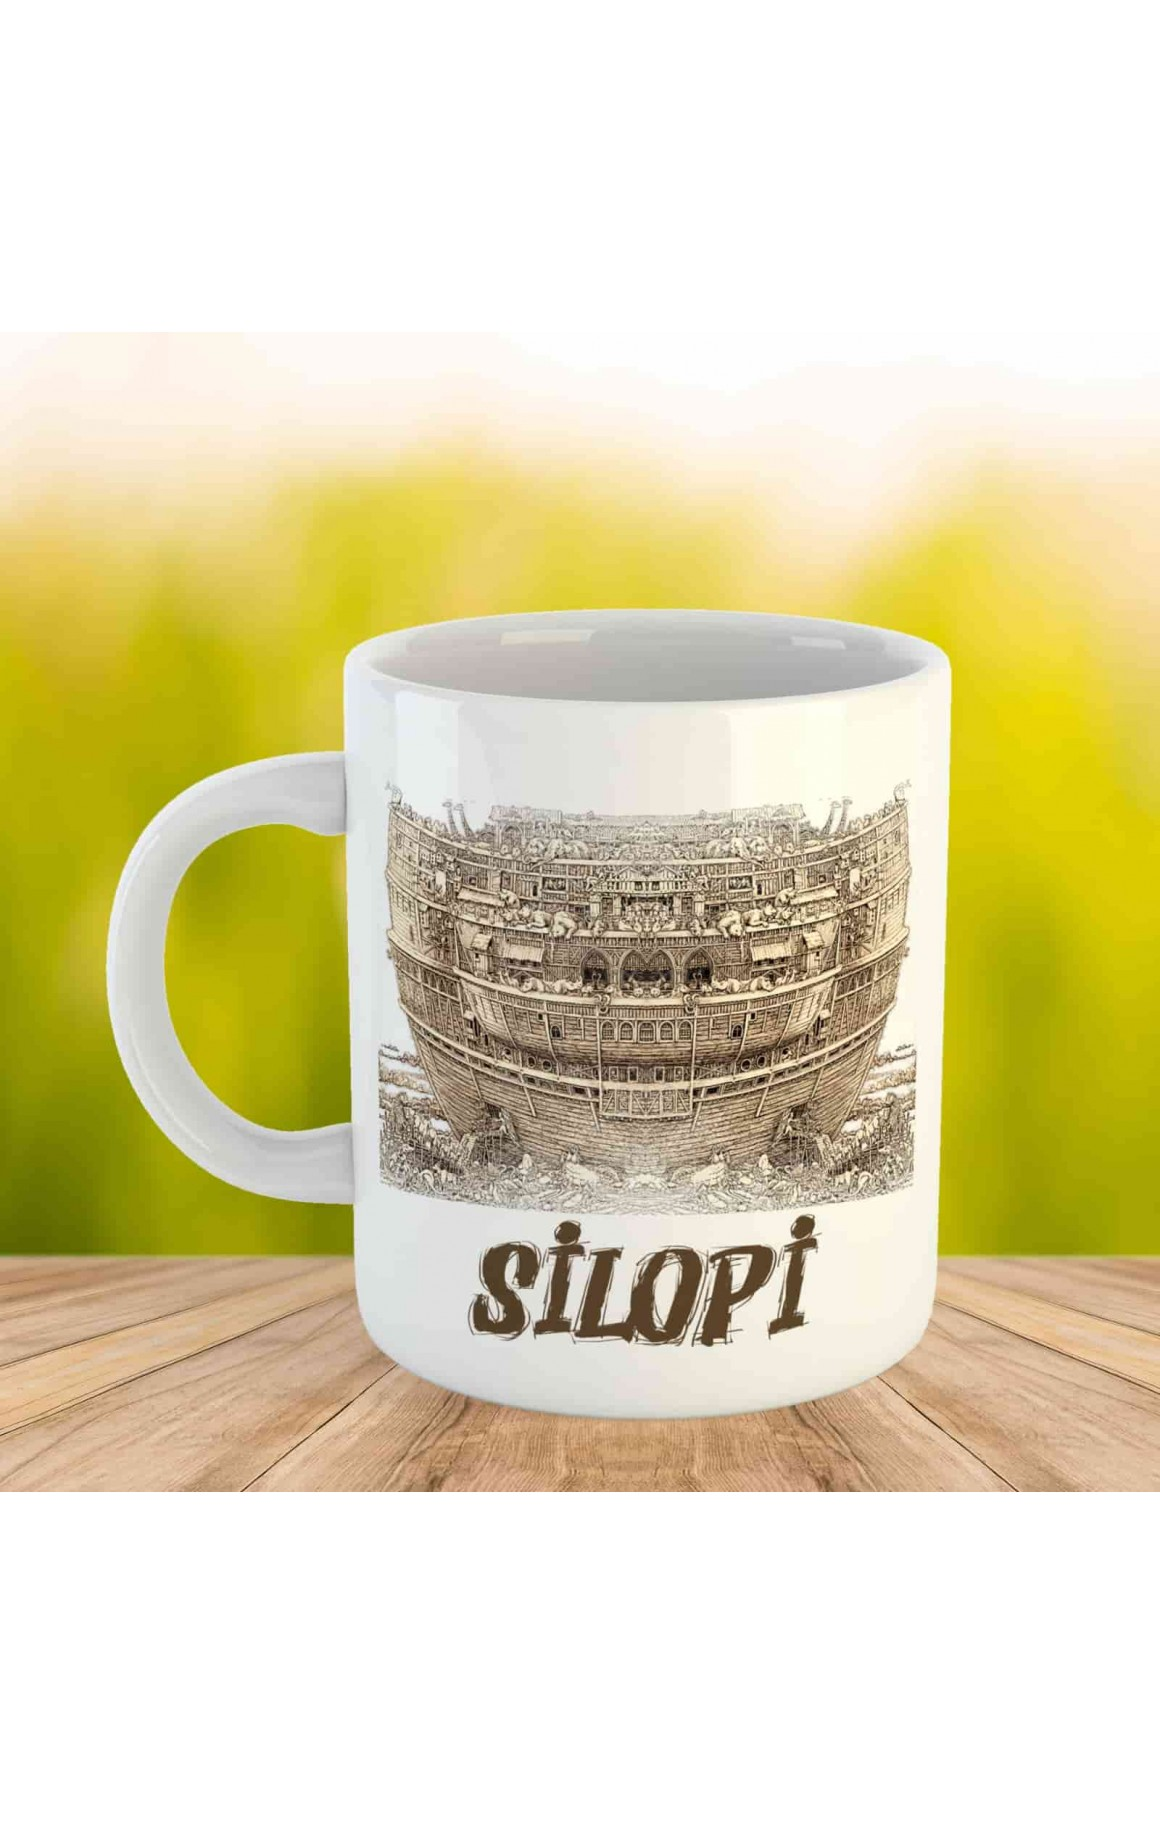 Silopi Kupası - Porselen Kupa